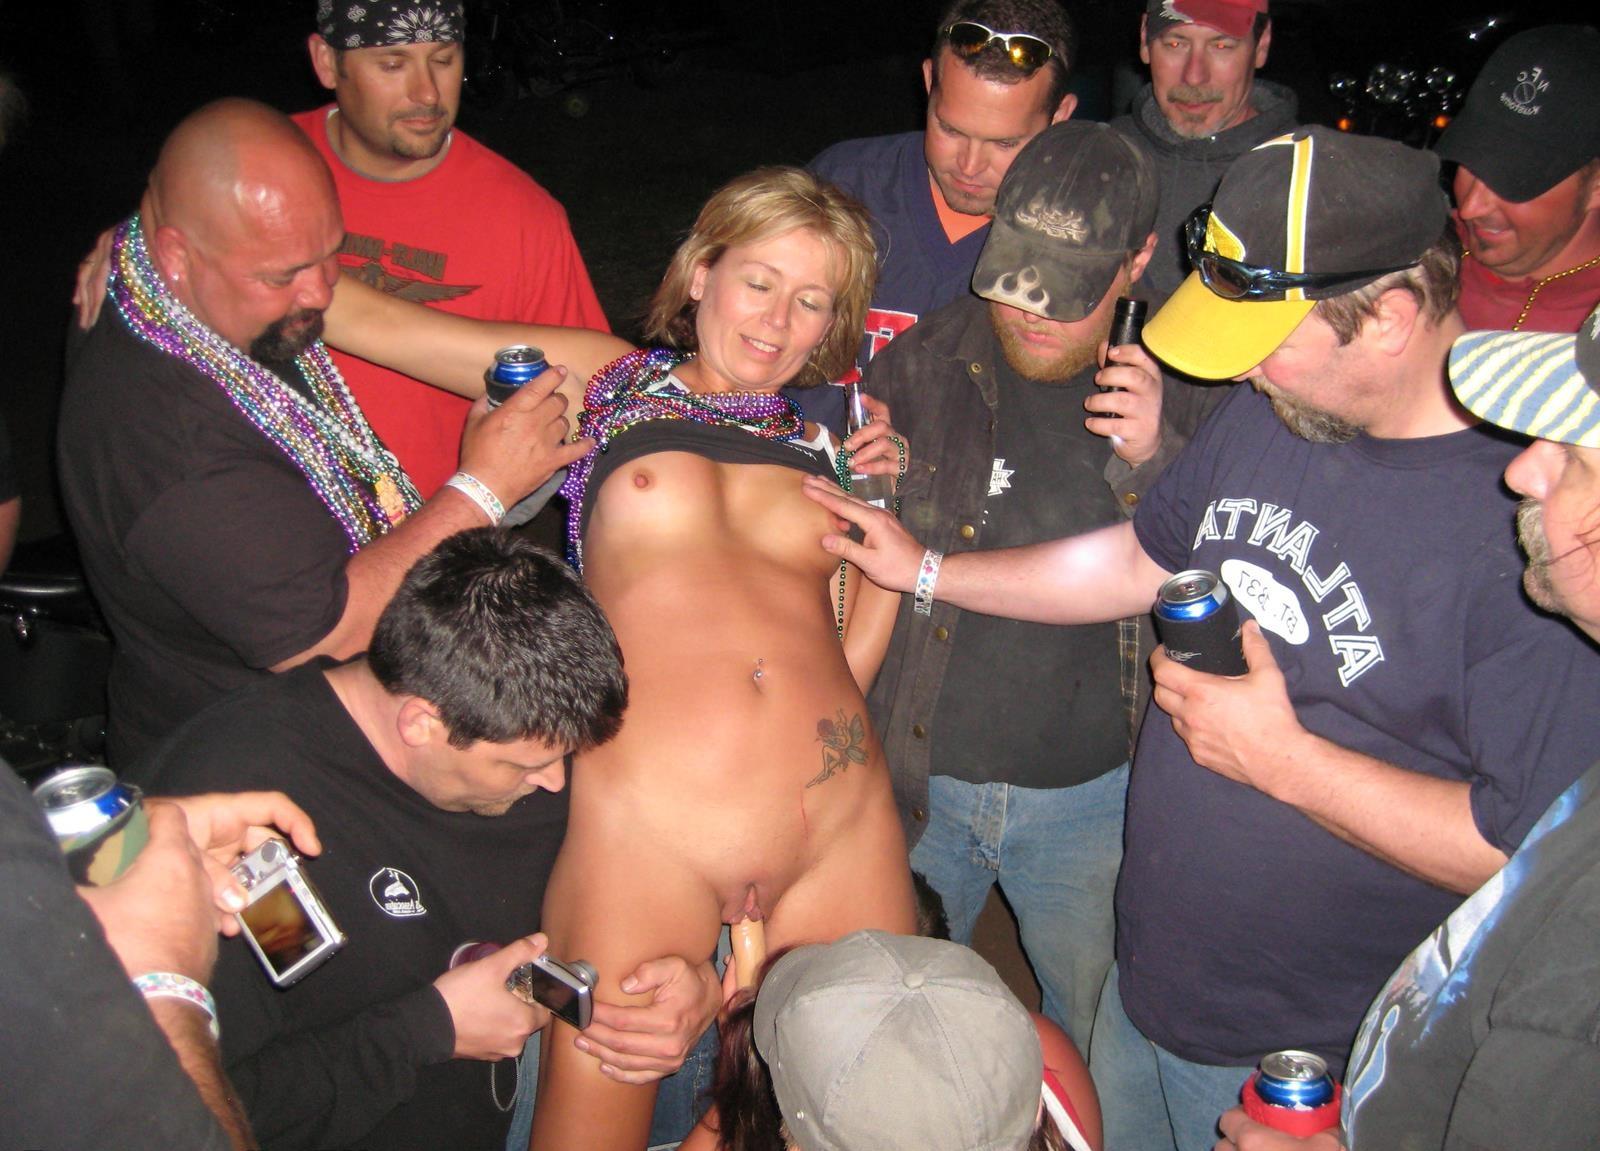 Public drunken nude